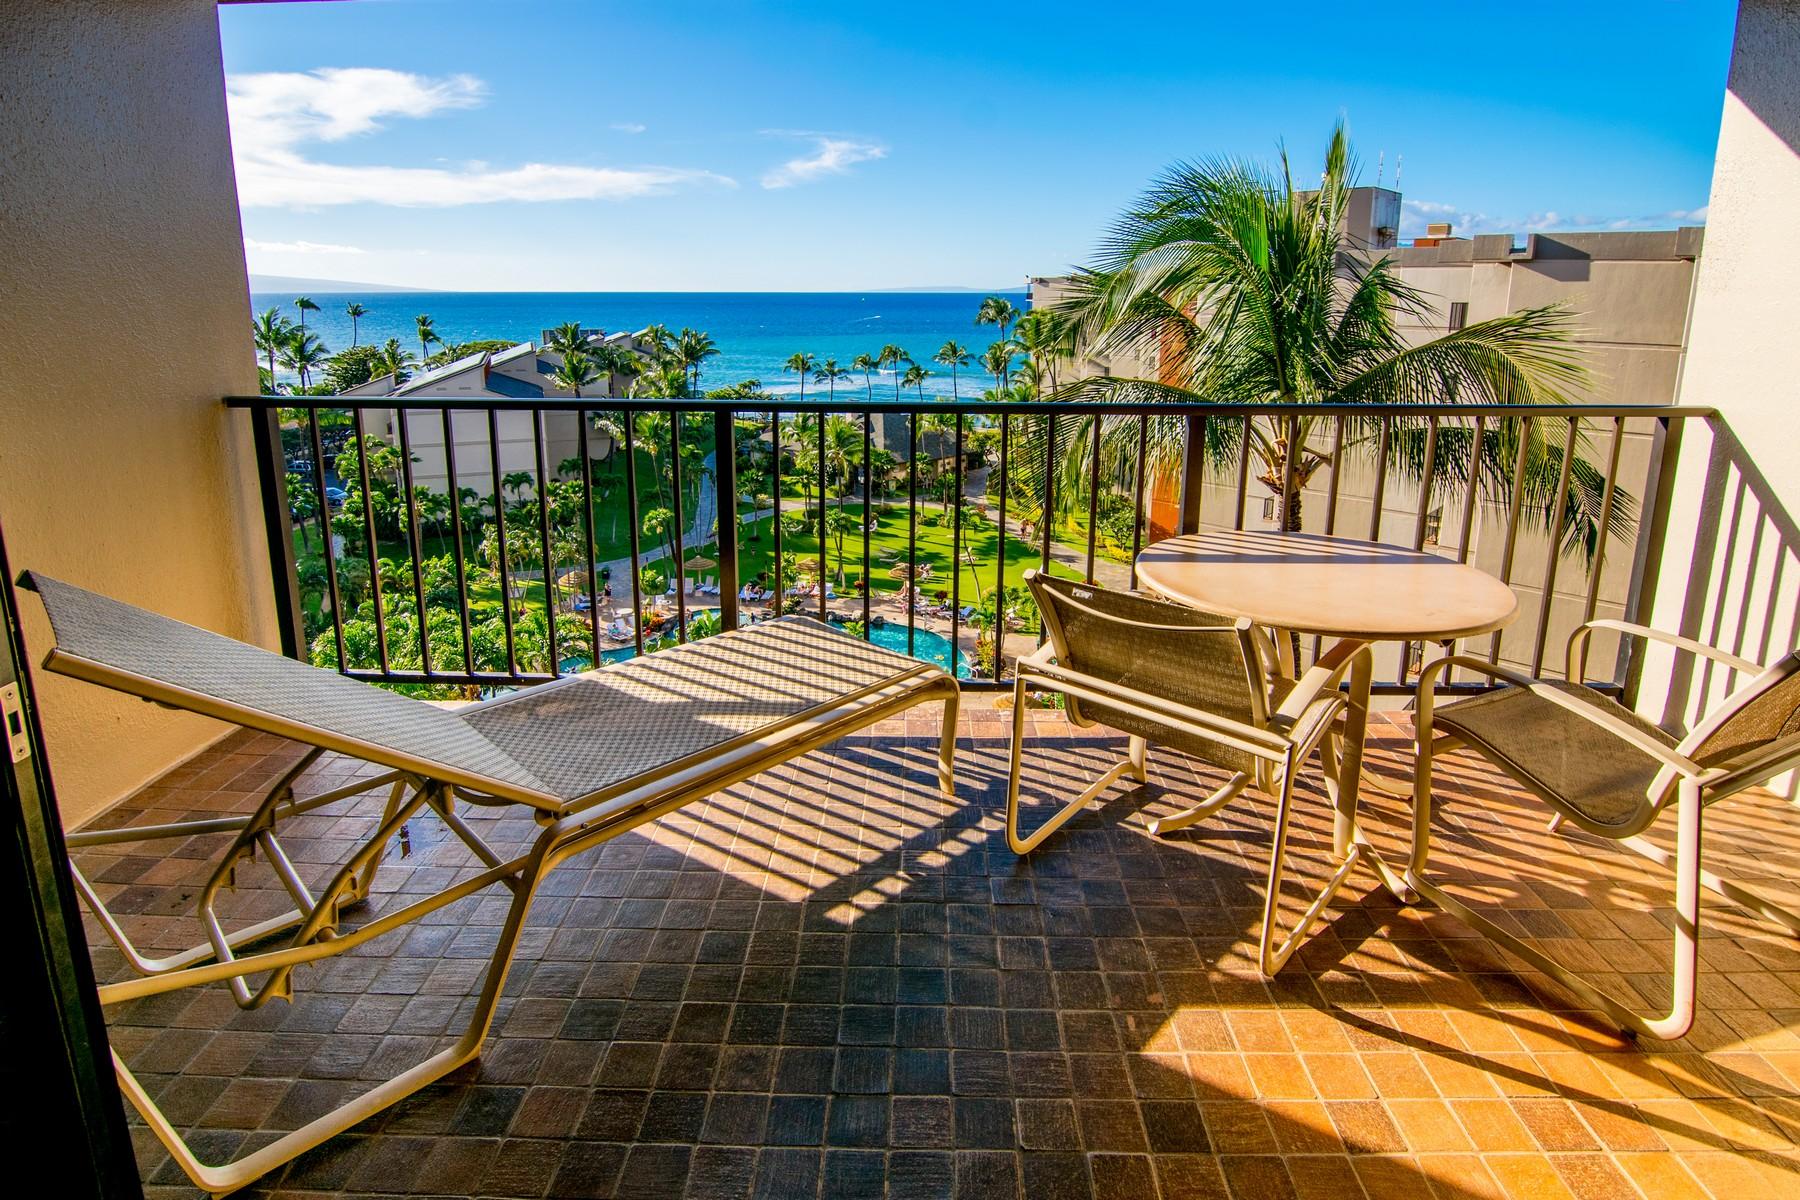 Кондоминиум для того Продажа на Kaanapali Luxury Condo With Incredible Views 3445 Lower Honoapiilani Road, Kaanapali Shores 927 Kaanapali, Гавайи, 96761 Соединенные Штаты